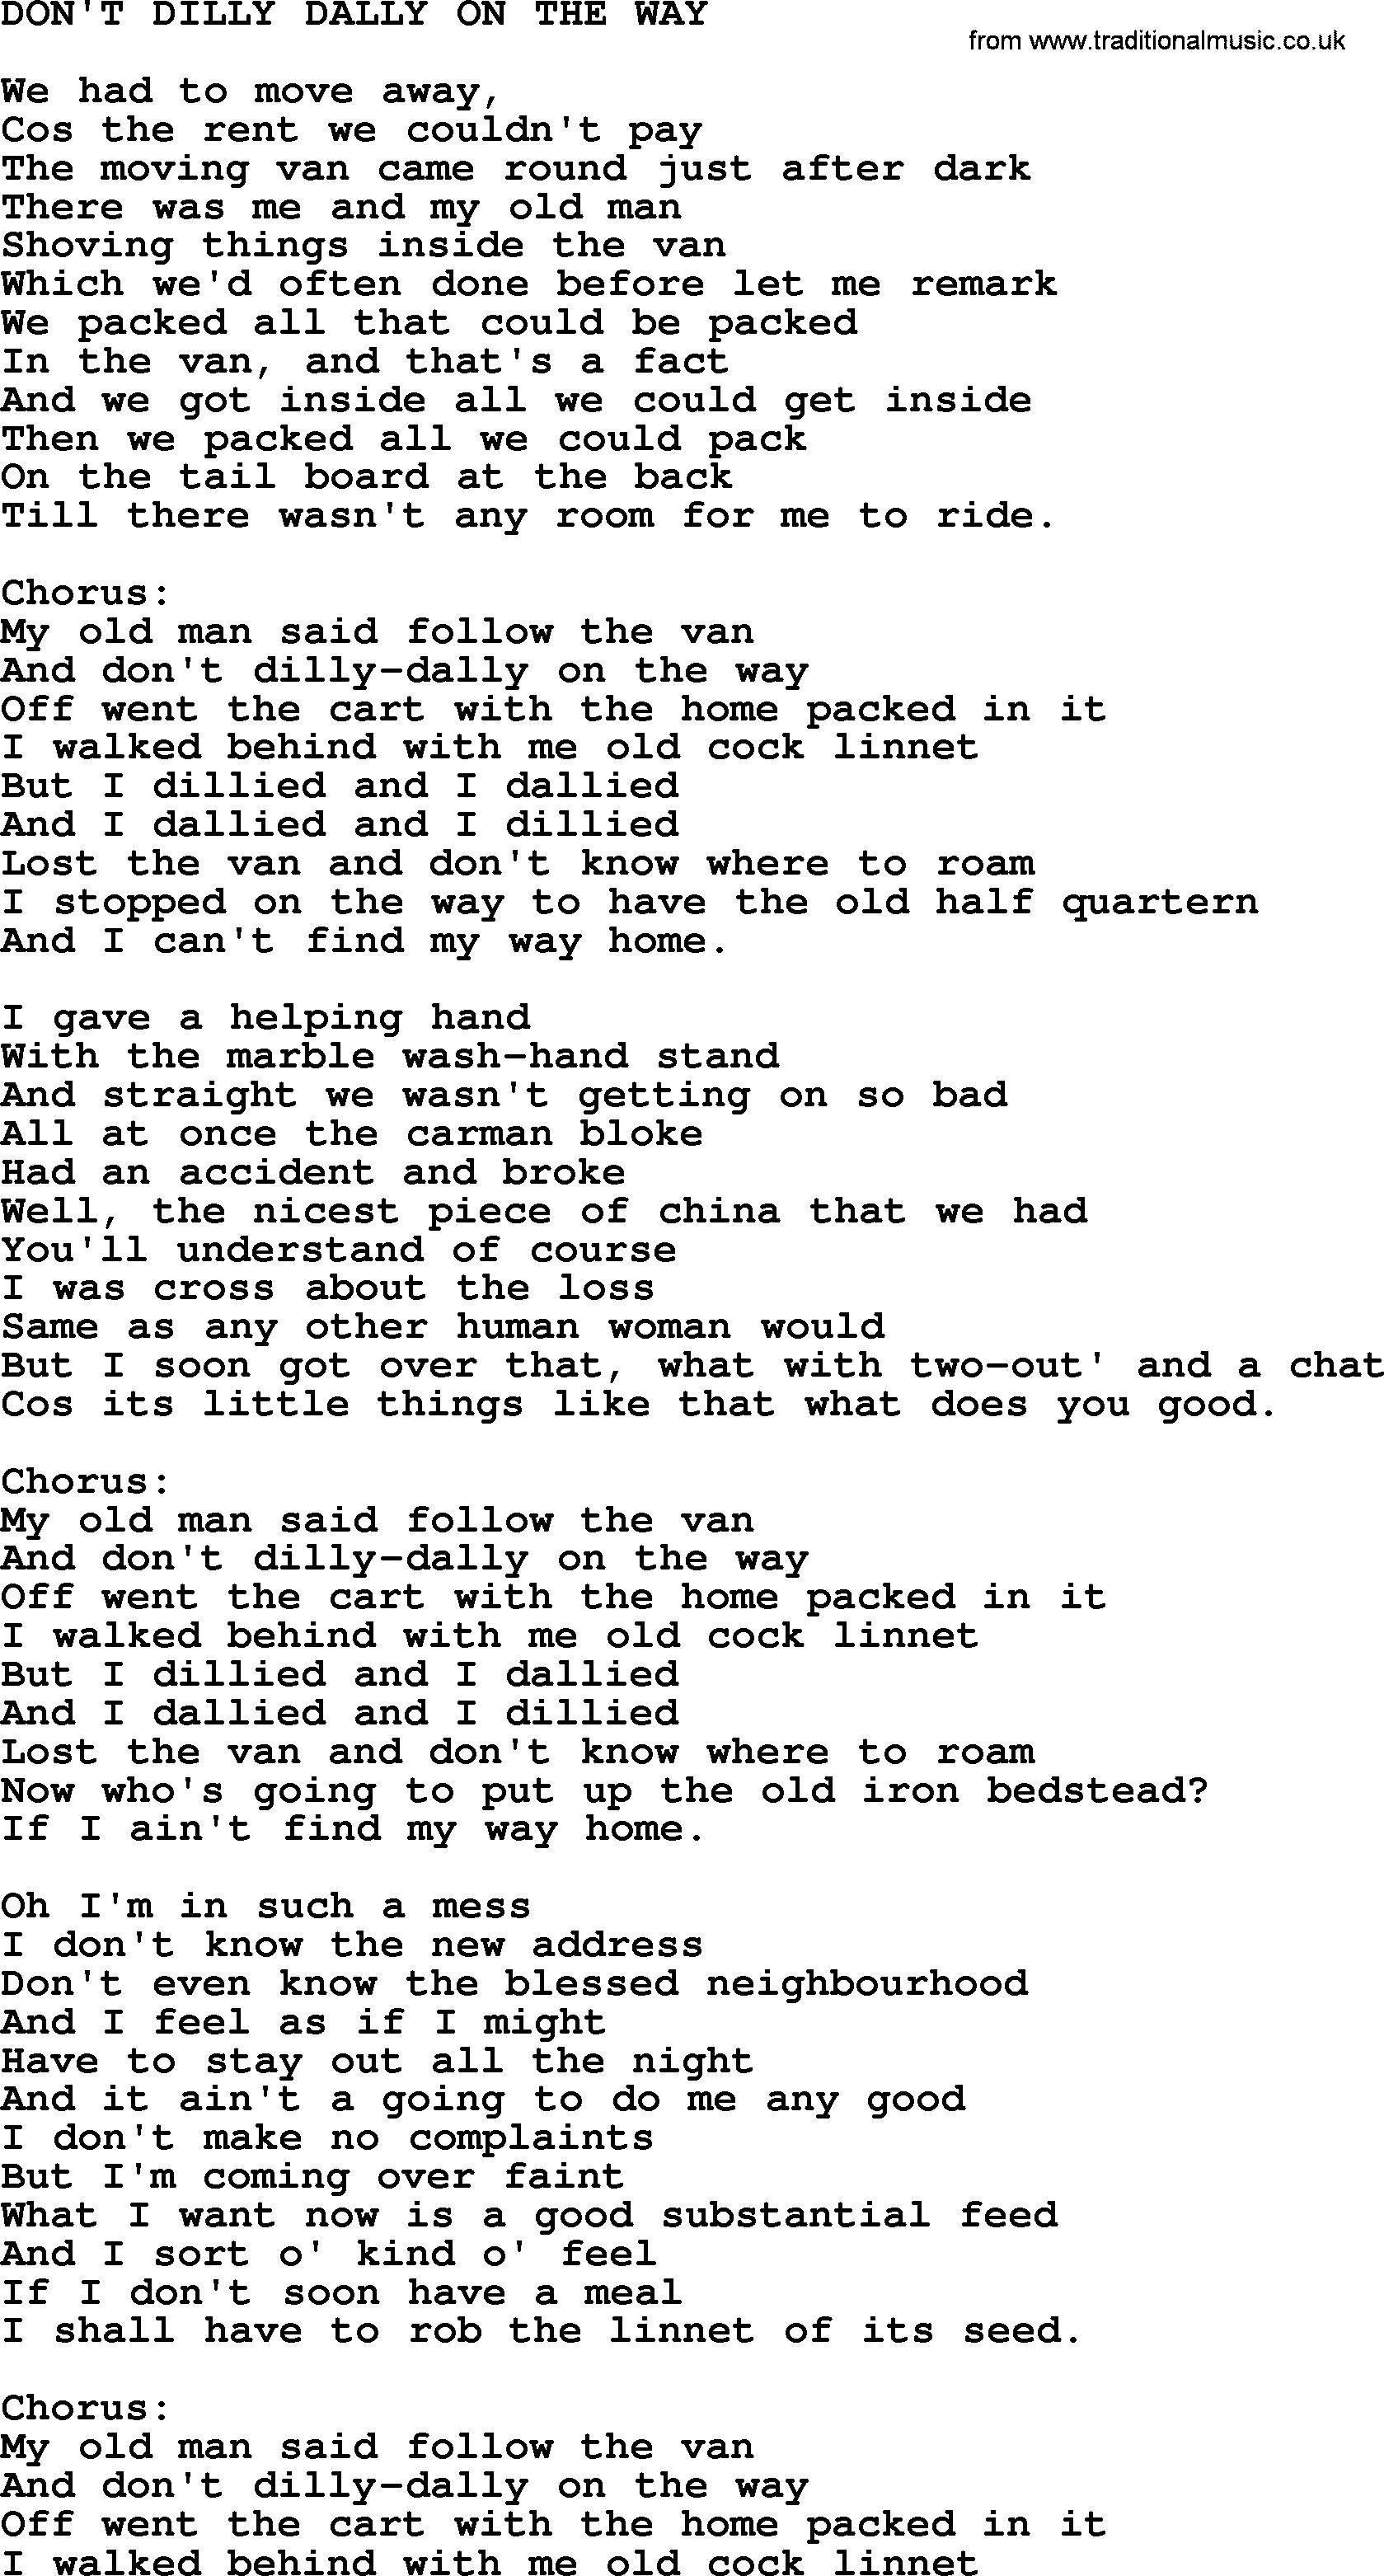 One song lyrics